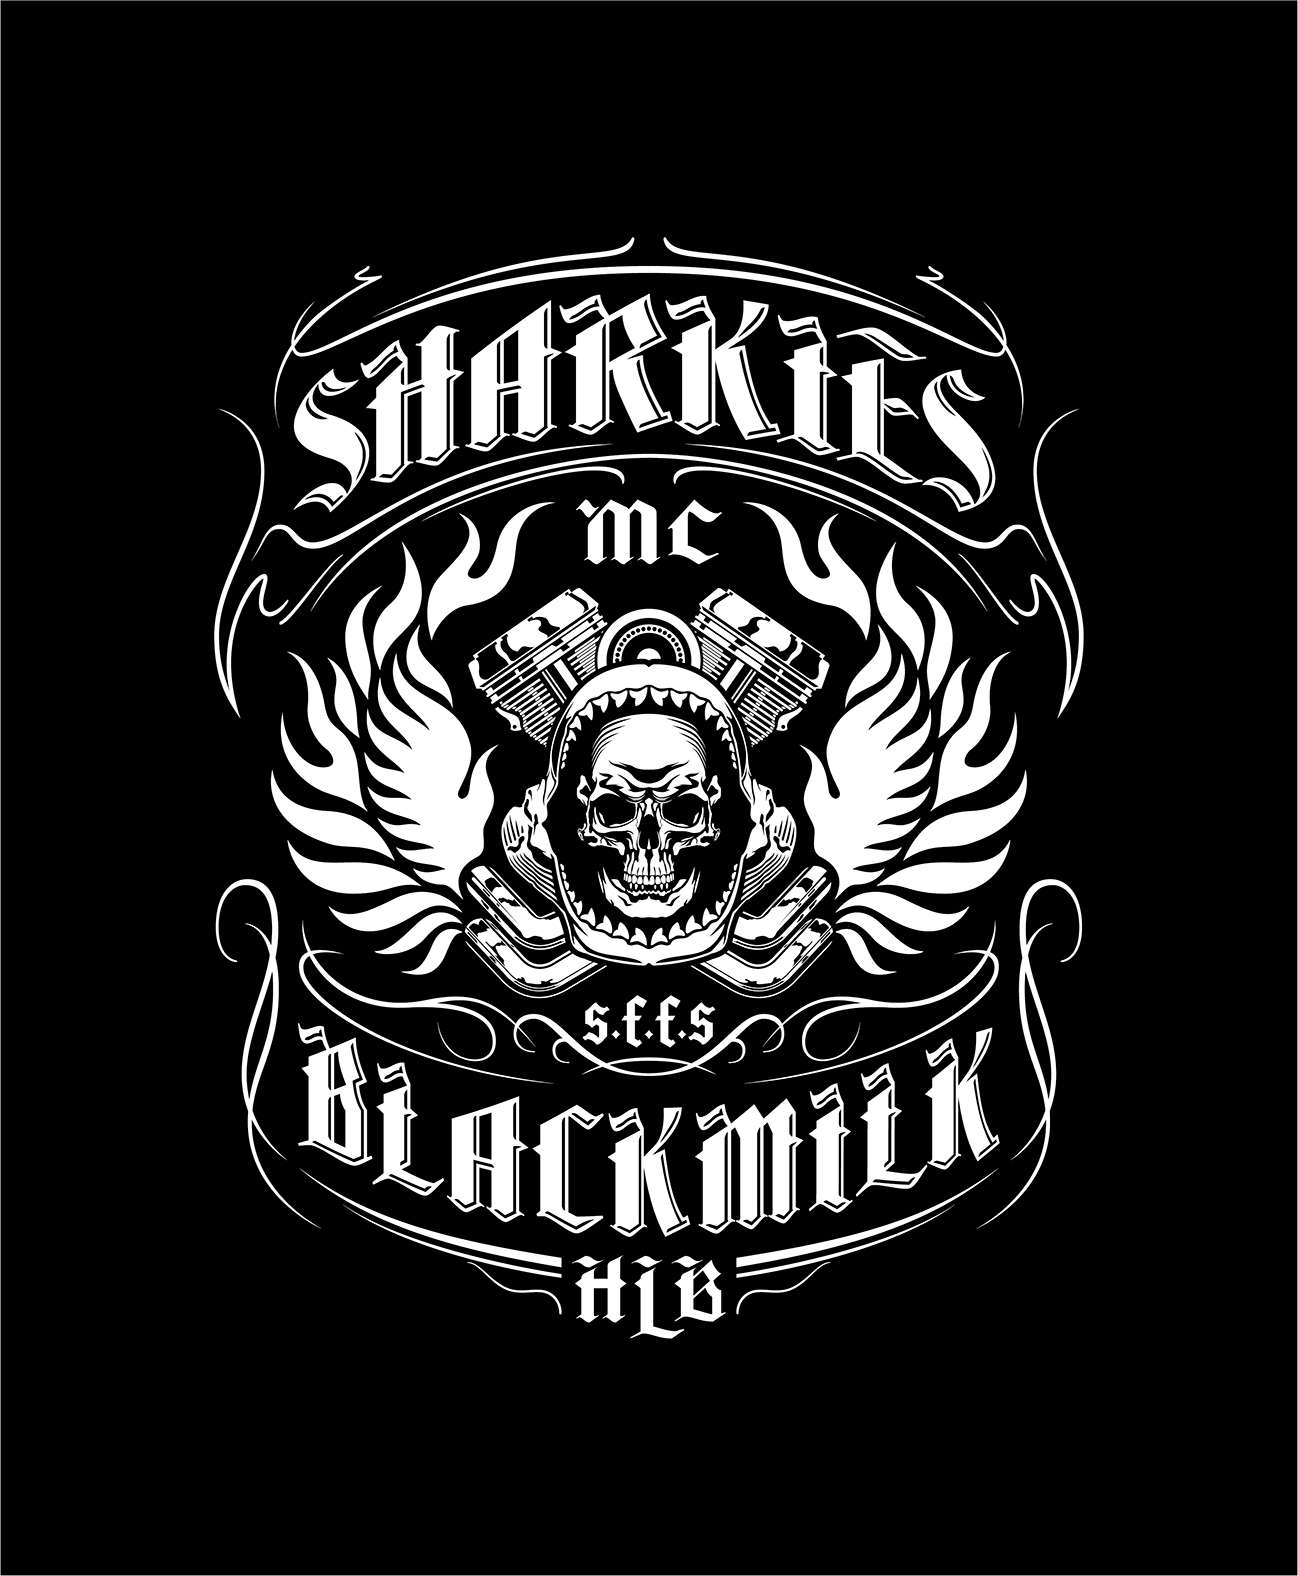 sharkie bikers final.jpg